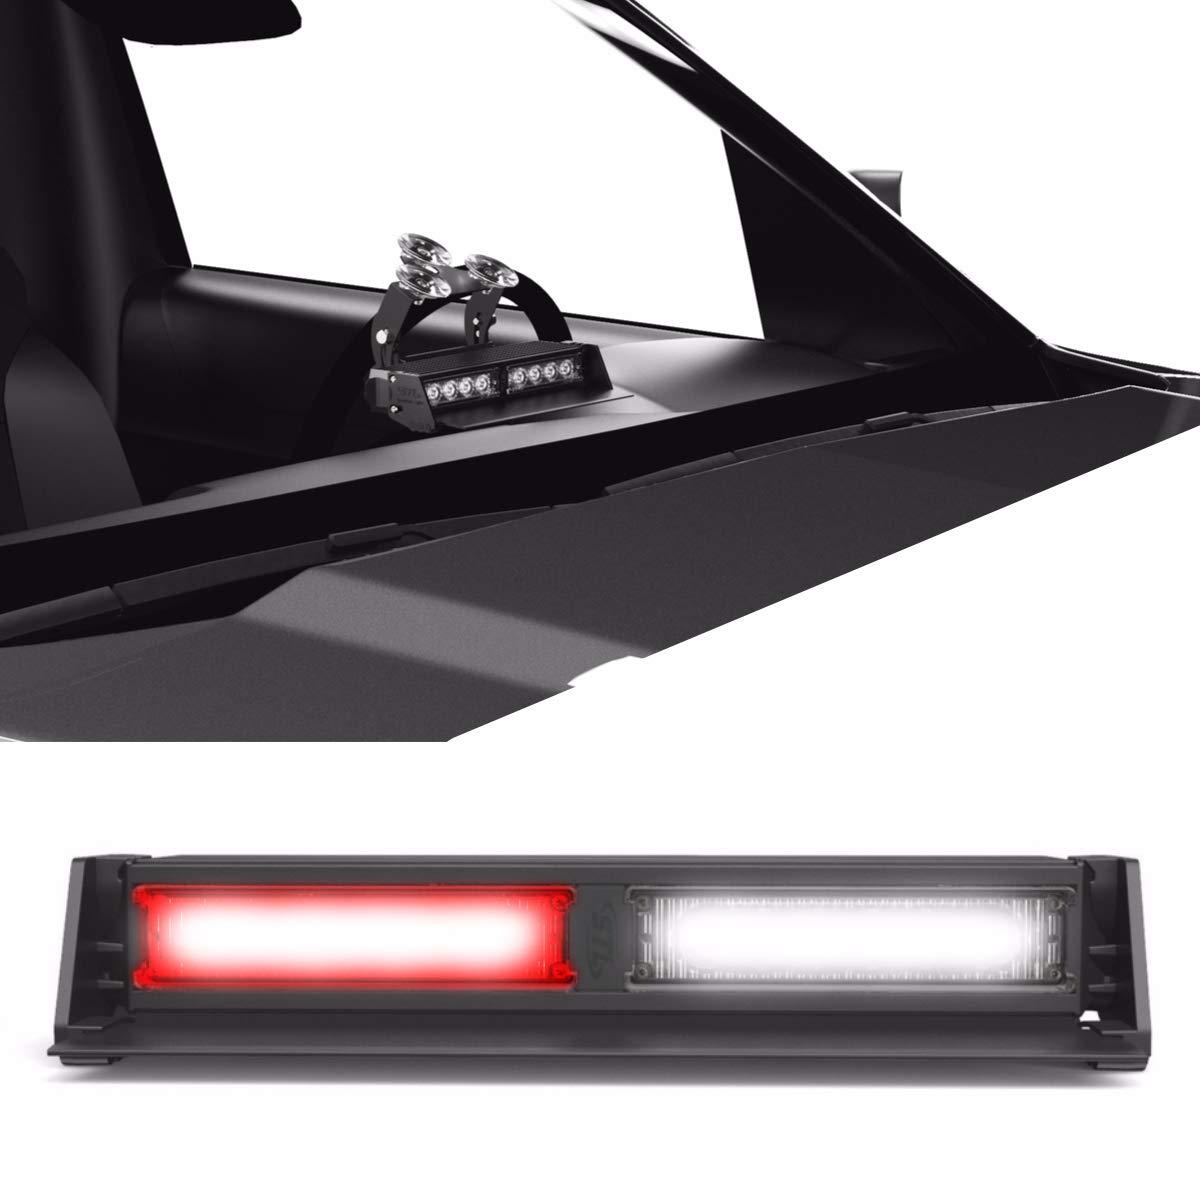 Striker TIR 2 Head LED Dash Light for Emergency Vehicles//Warning Strobe Deck//Dash Light Windshield Mount Amber//Clear